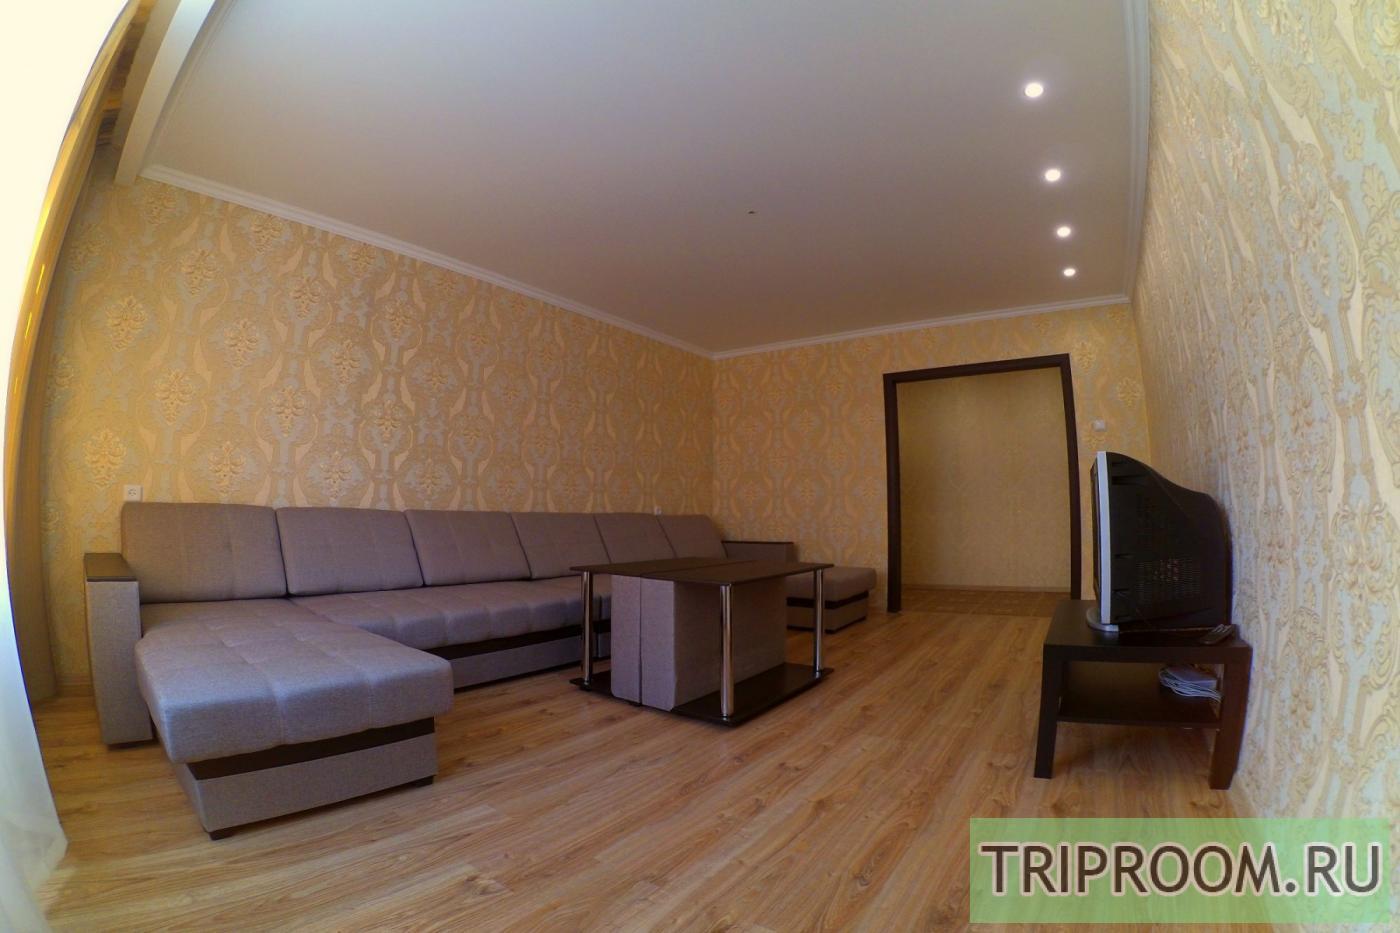 3-комнатная квартира посуточно (вариант № 20683), ул. Рашида Вагапова, фото № 2